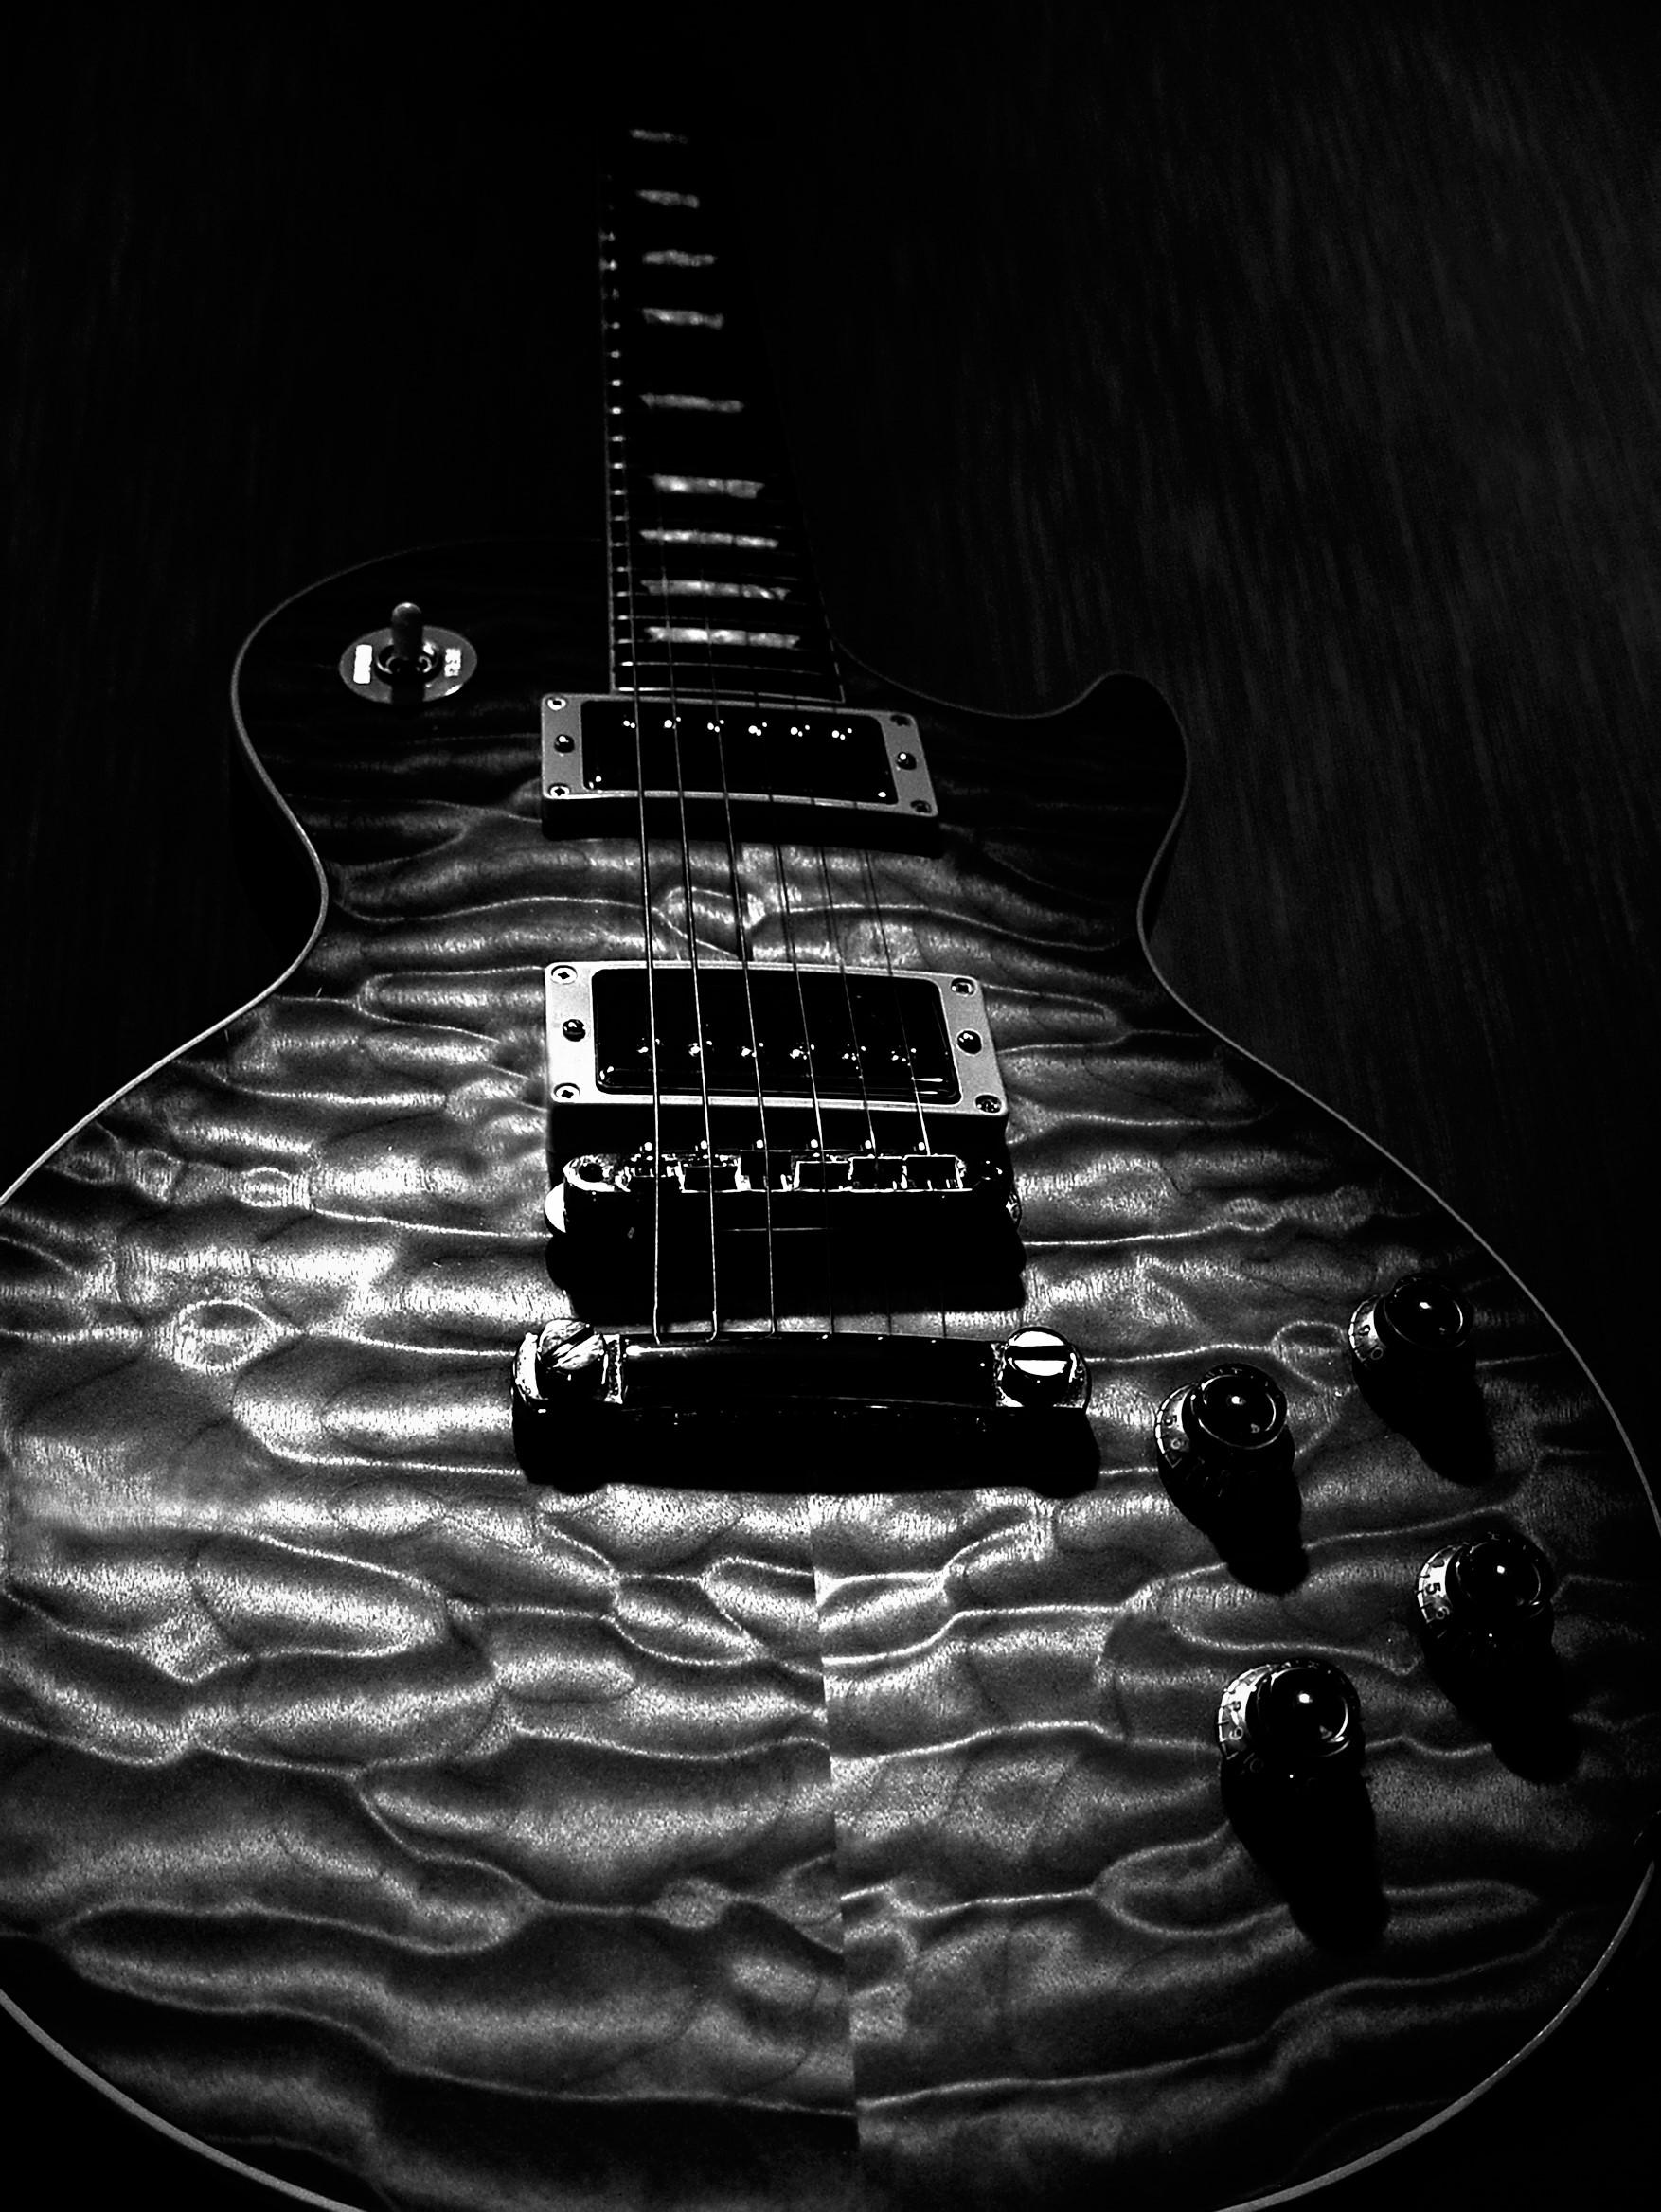 Gibson Les Paul Quilt Top Guitar